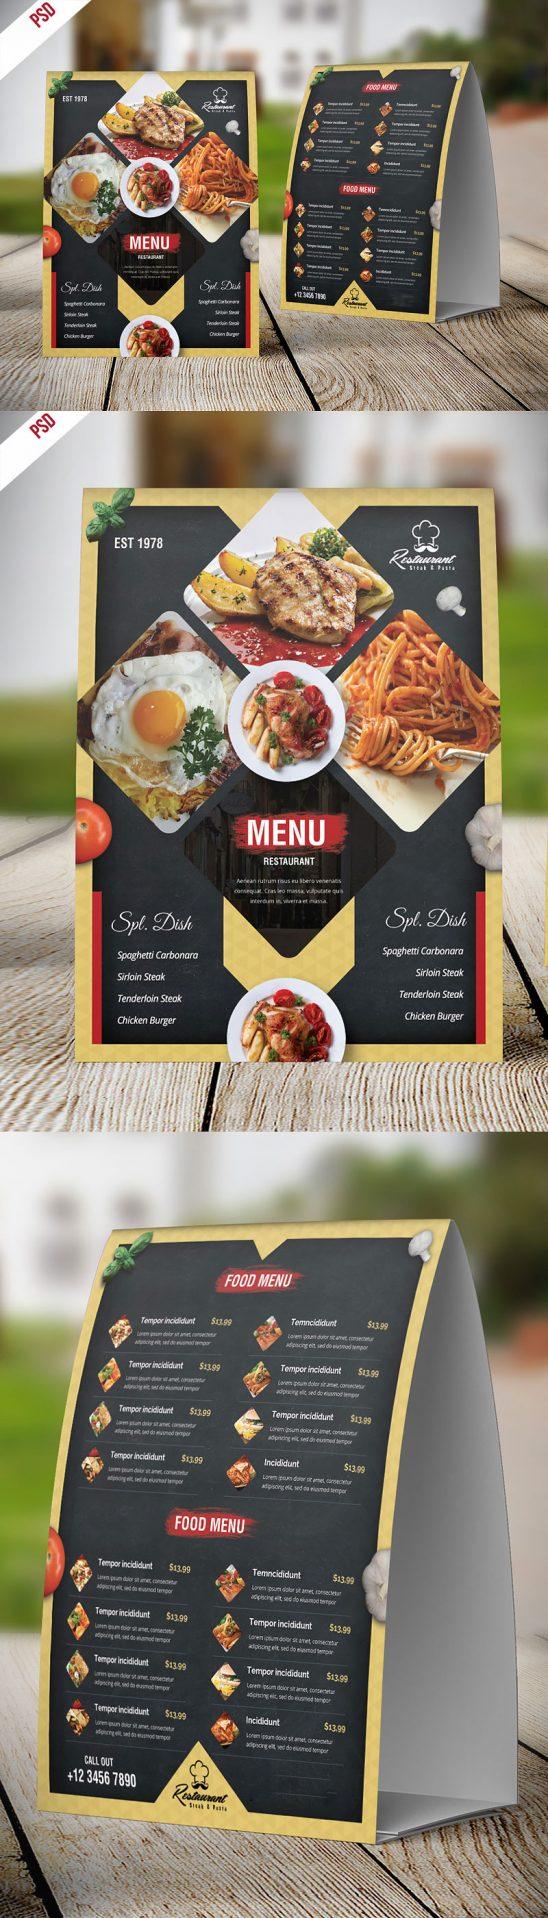 p326 548x1918 - لایه باز منوی غذای رستوران کترینگ آشپزخانه